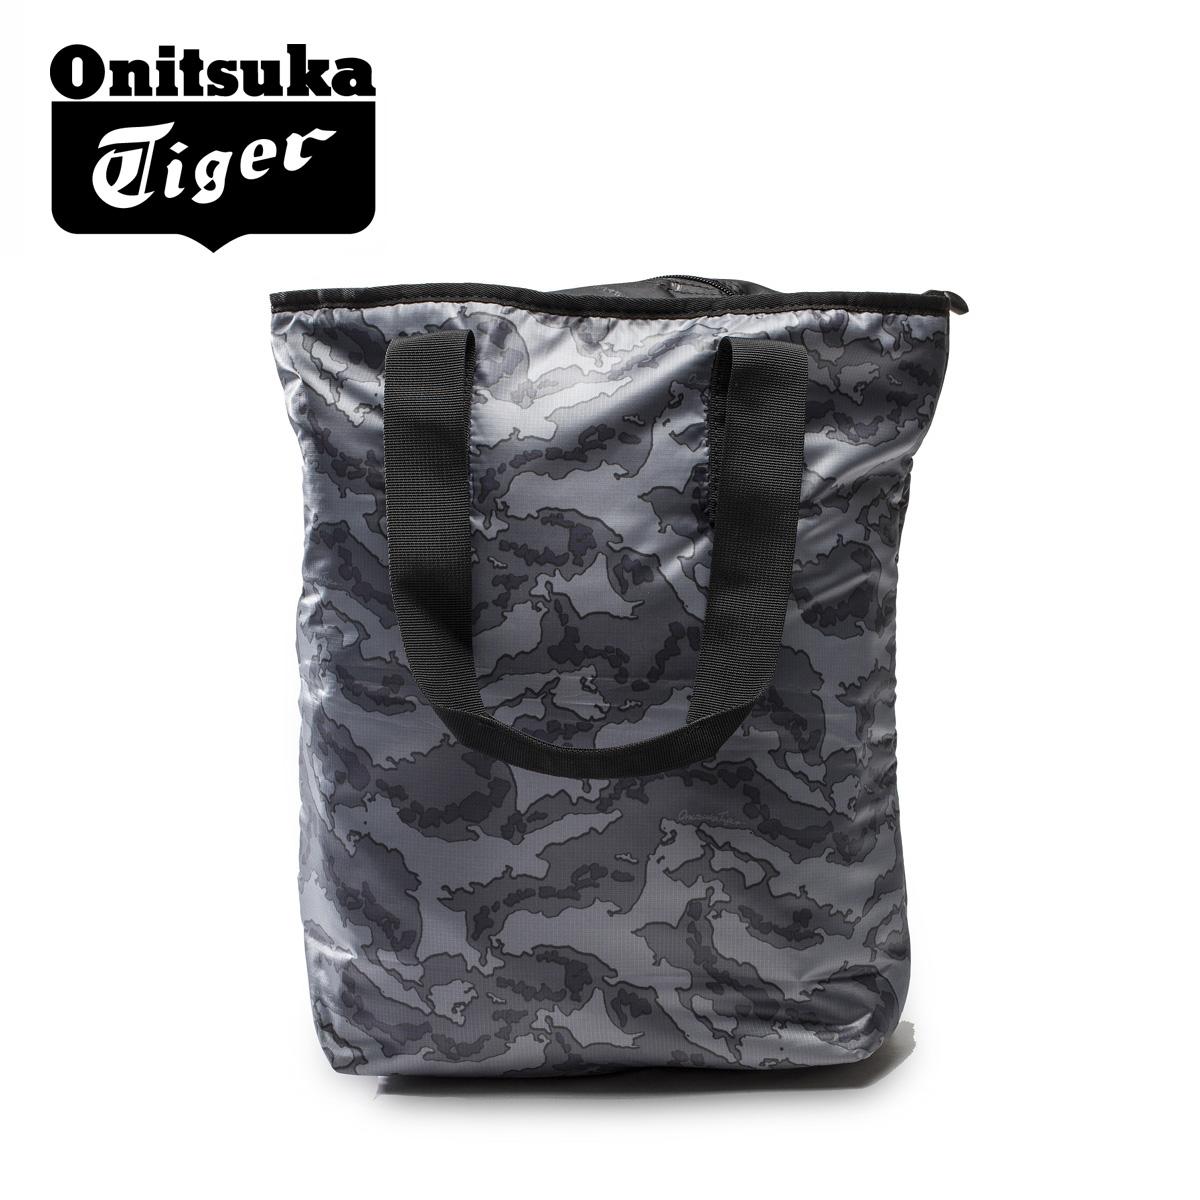 onitsuka tiger backpack Pink